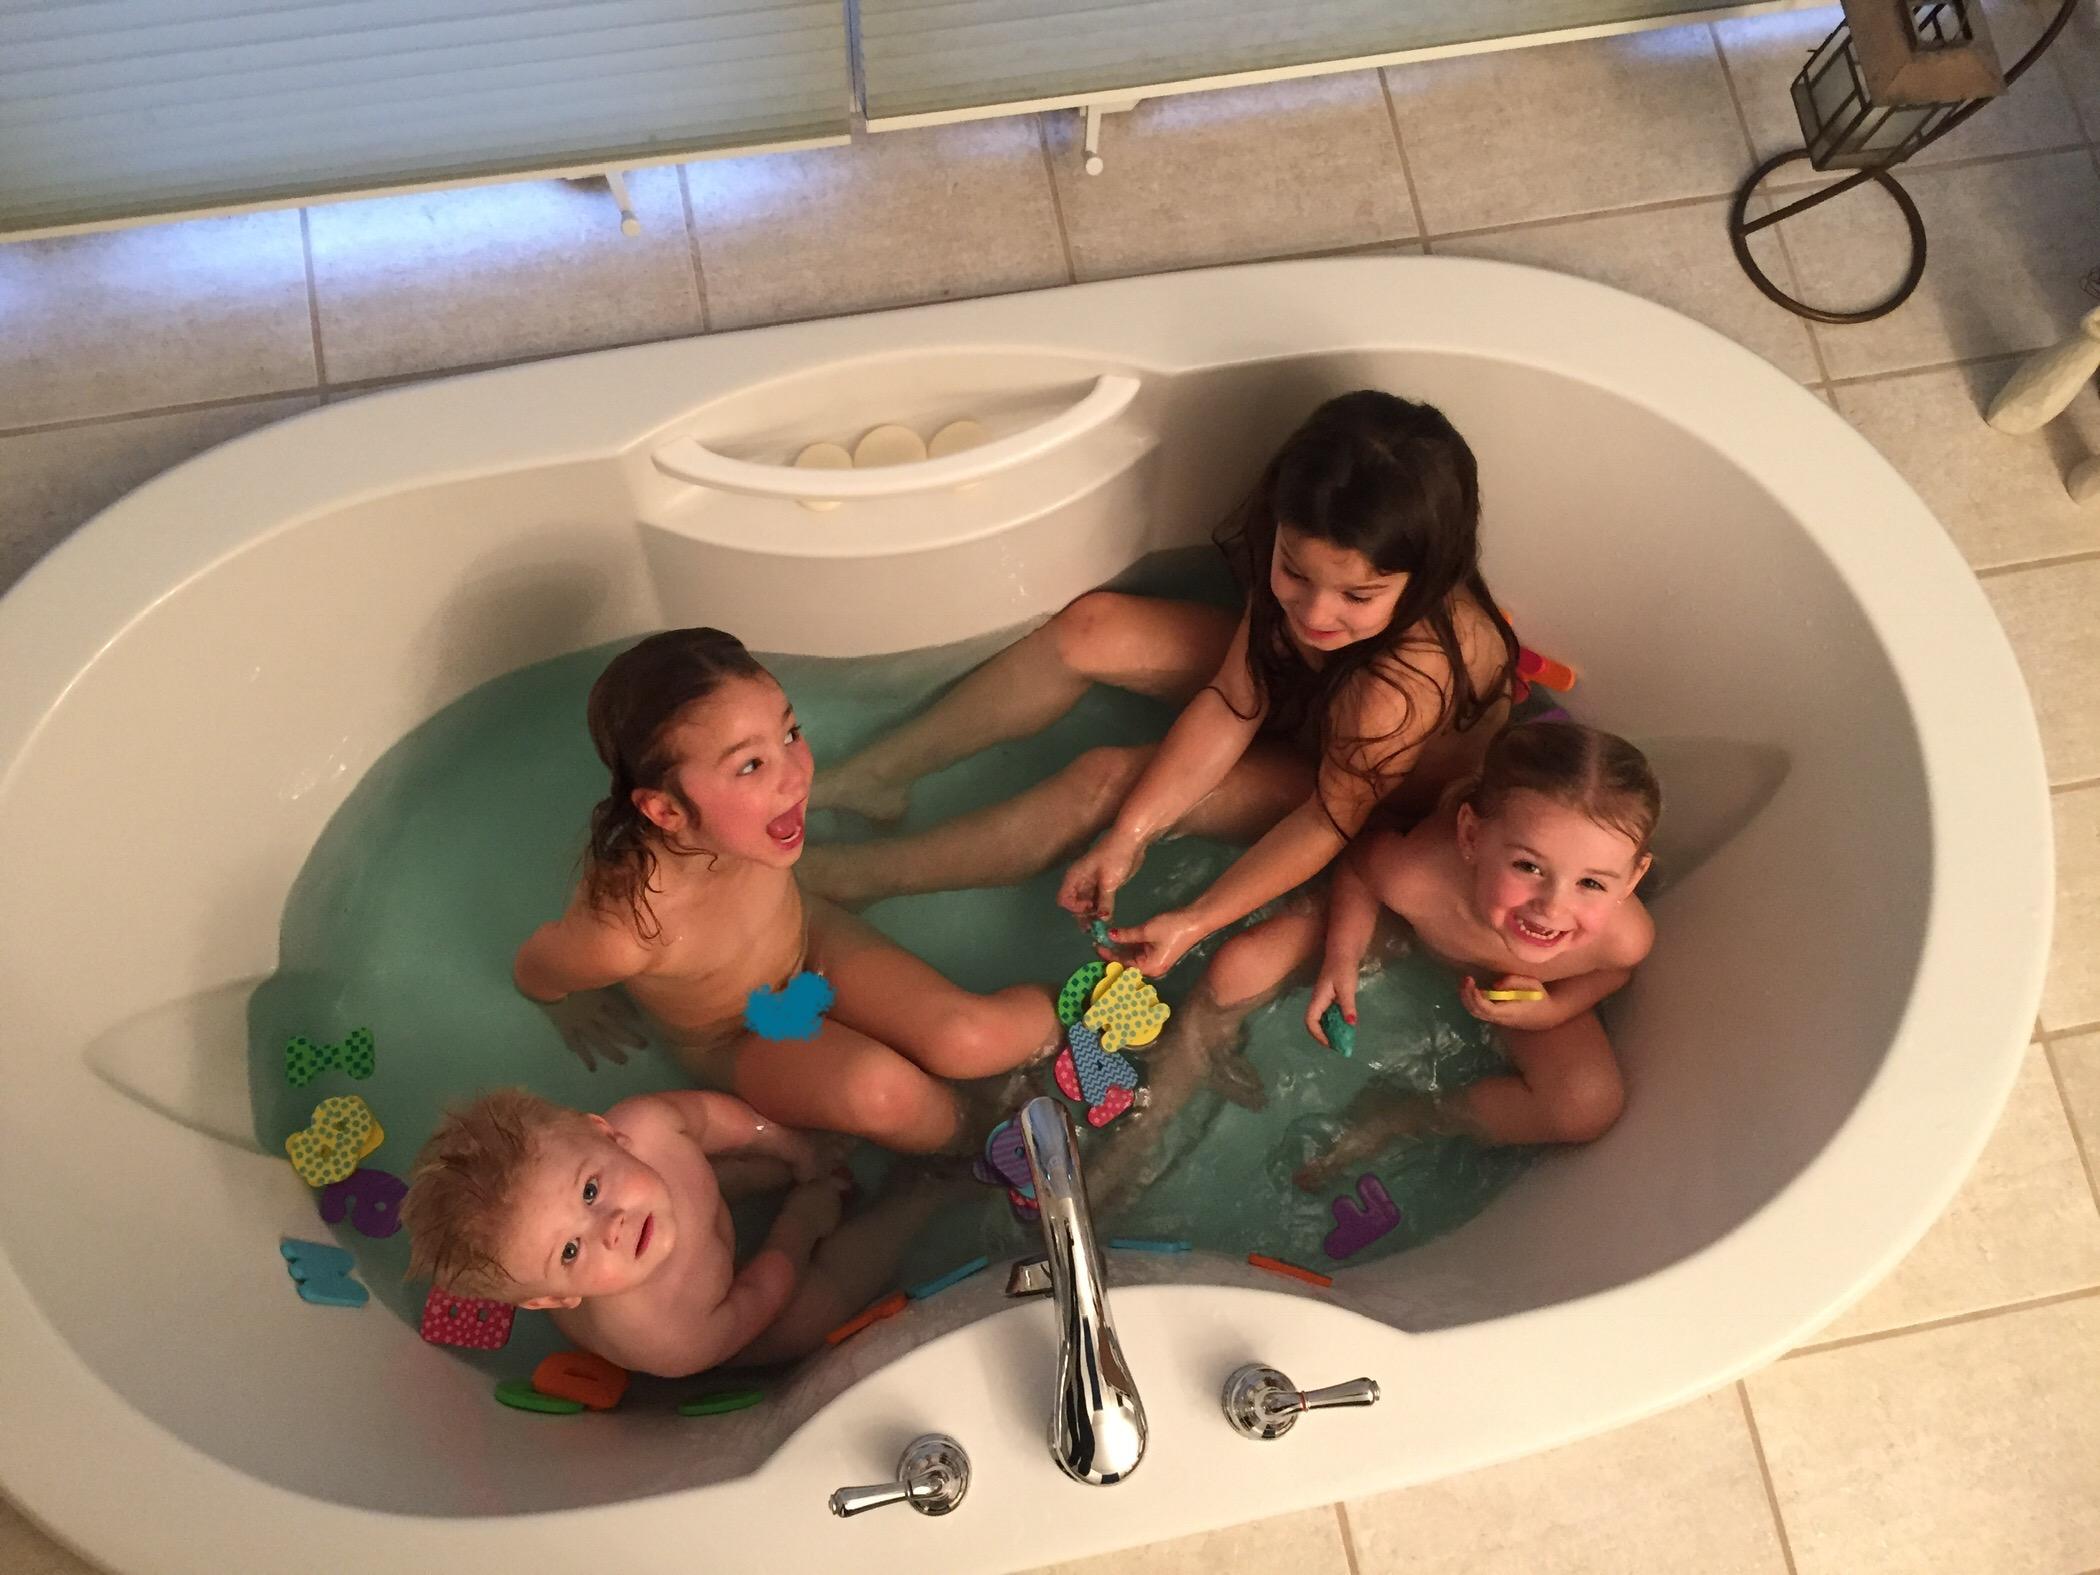 Kladder Christmas bathtub.jpg